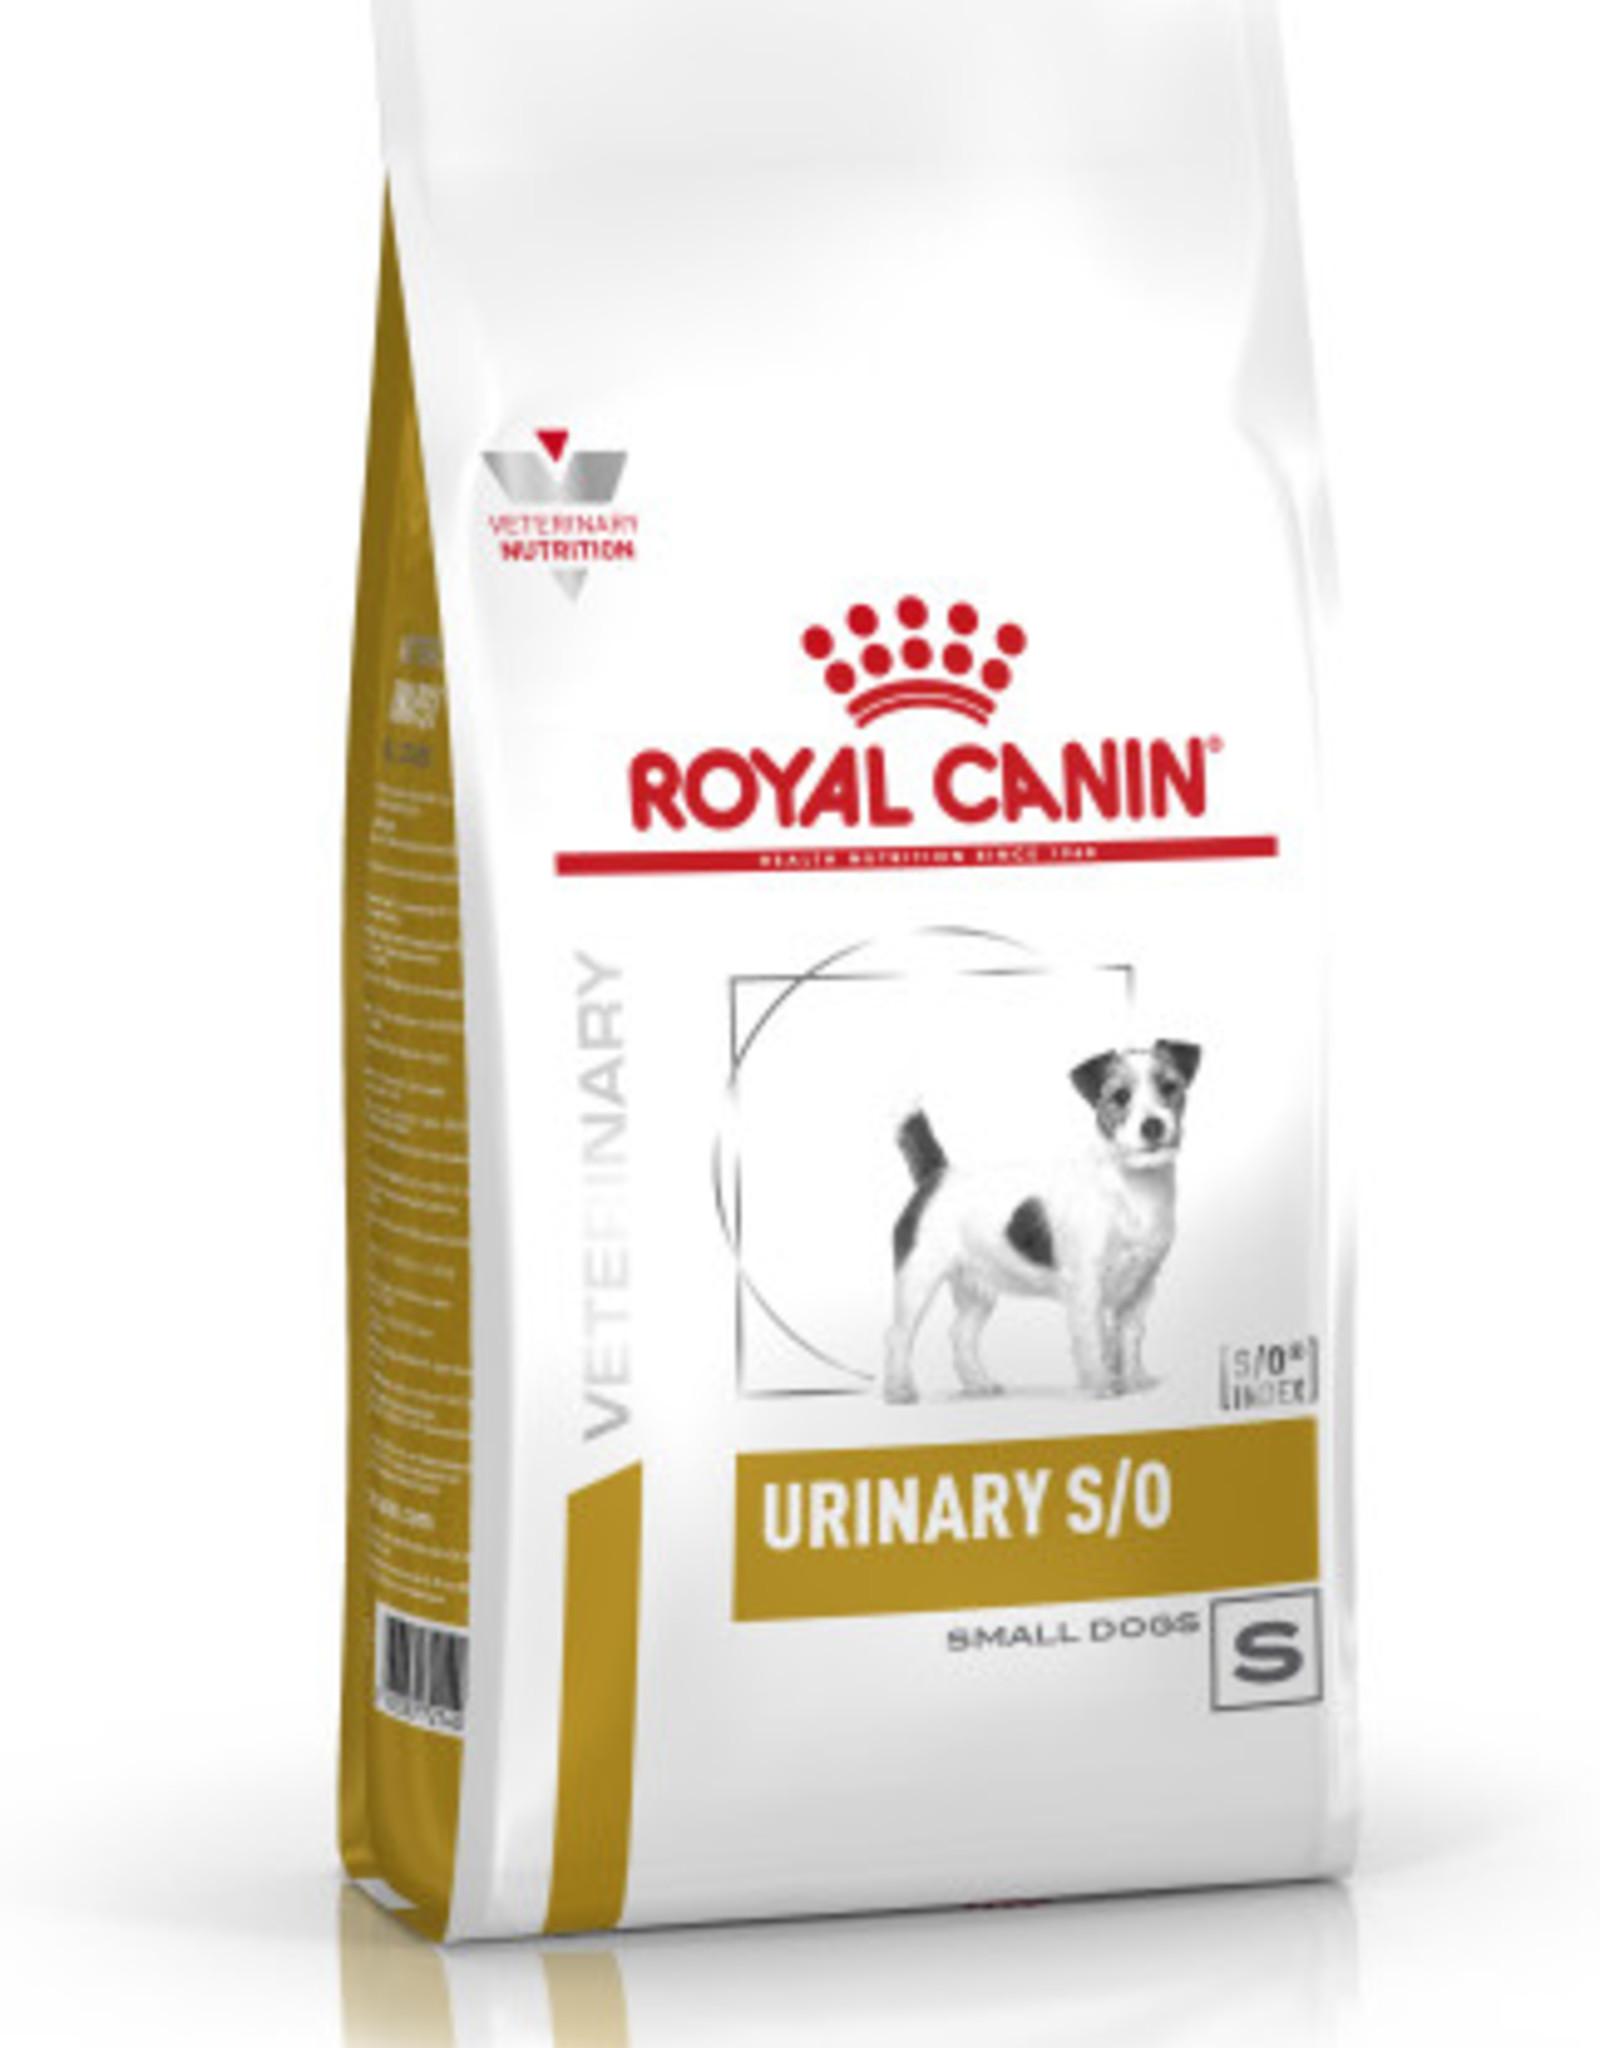 Royal Canin Royal Canin Urinary S/o Small Chien 1,5kg